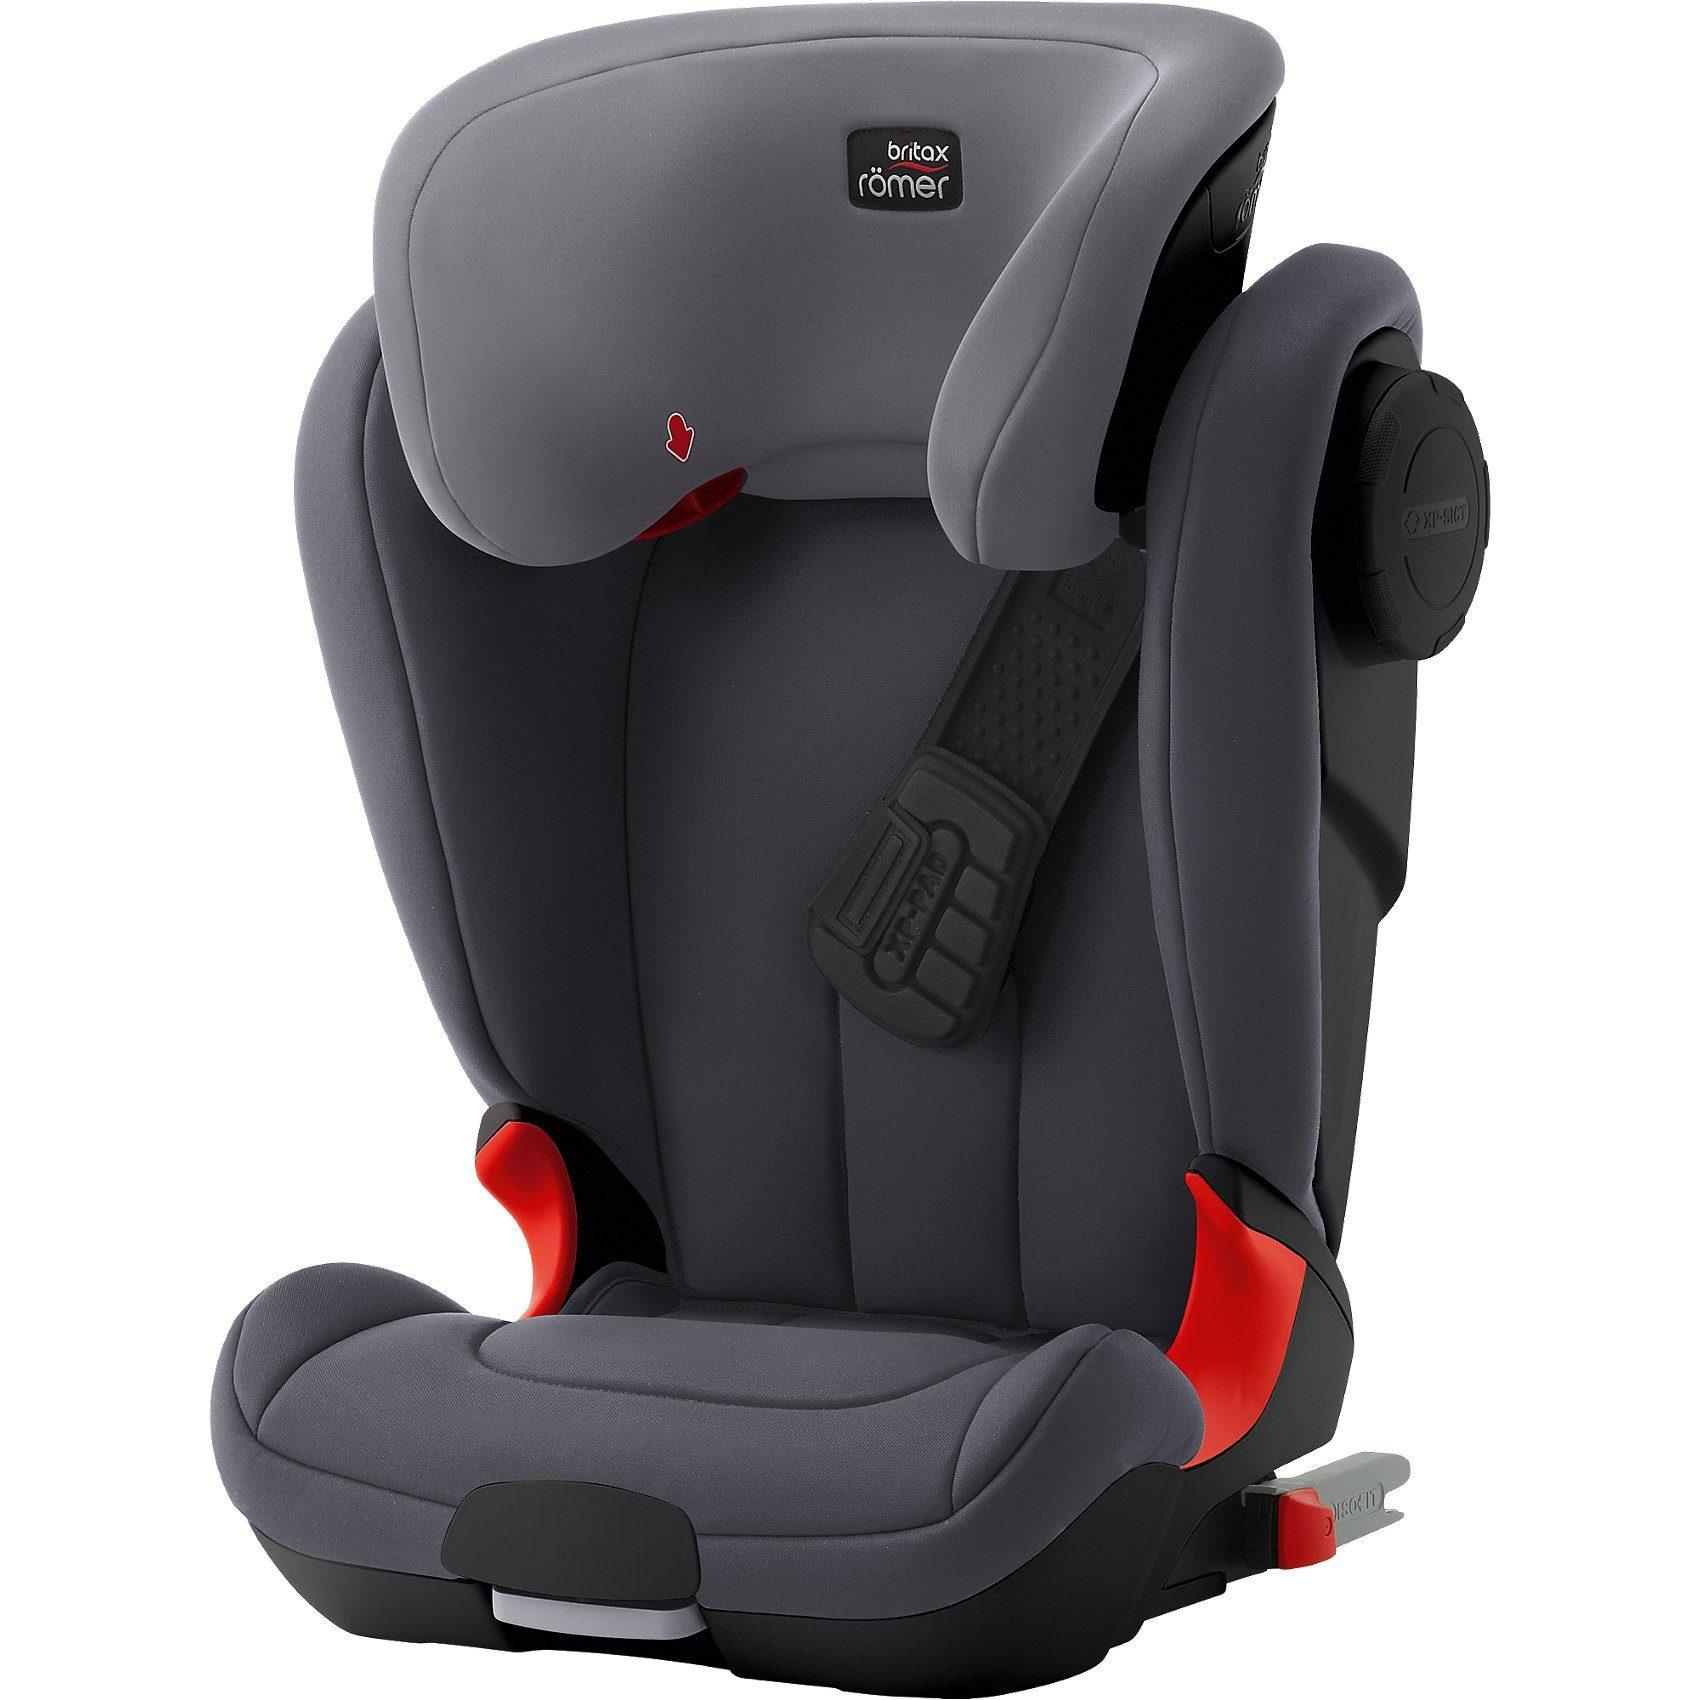 BRITAX RÖMER Auto-Kindersitz Kidfix XP SICT, Black Series, Storm Grey, 20